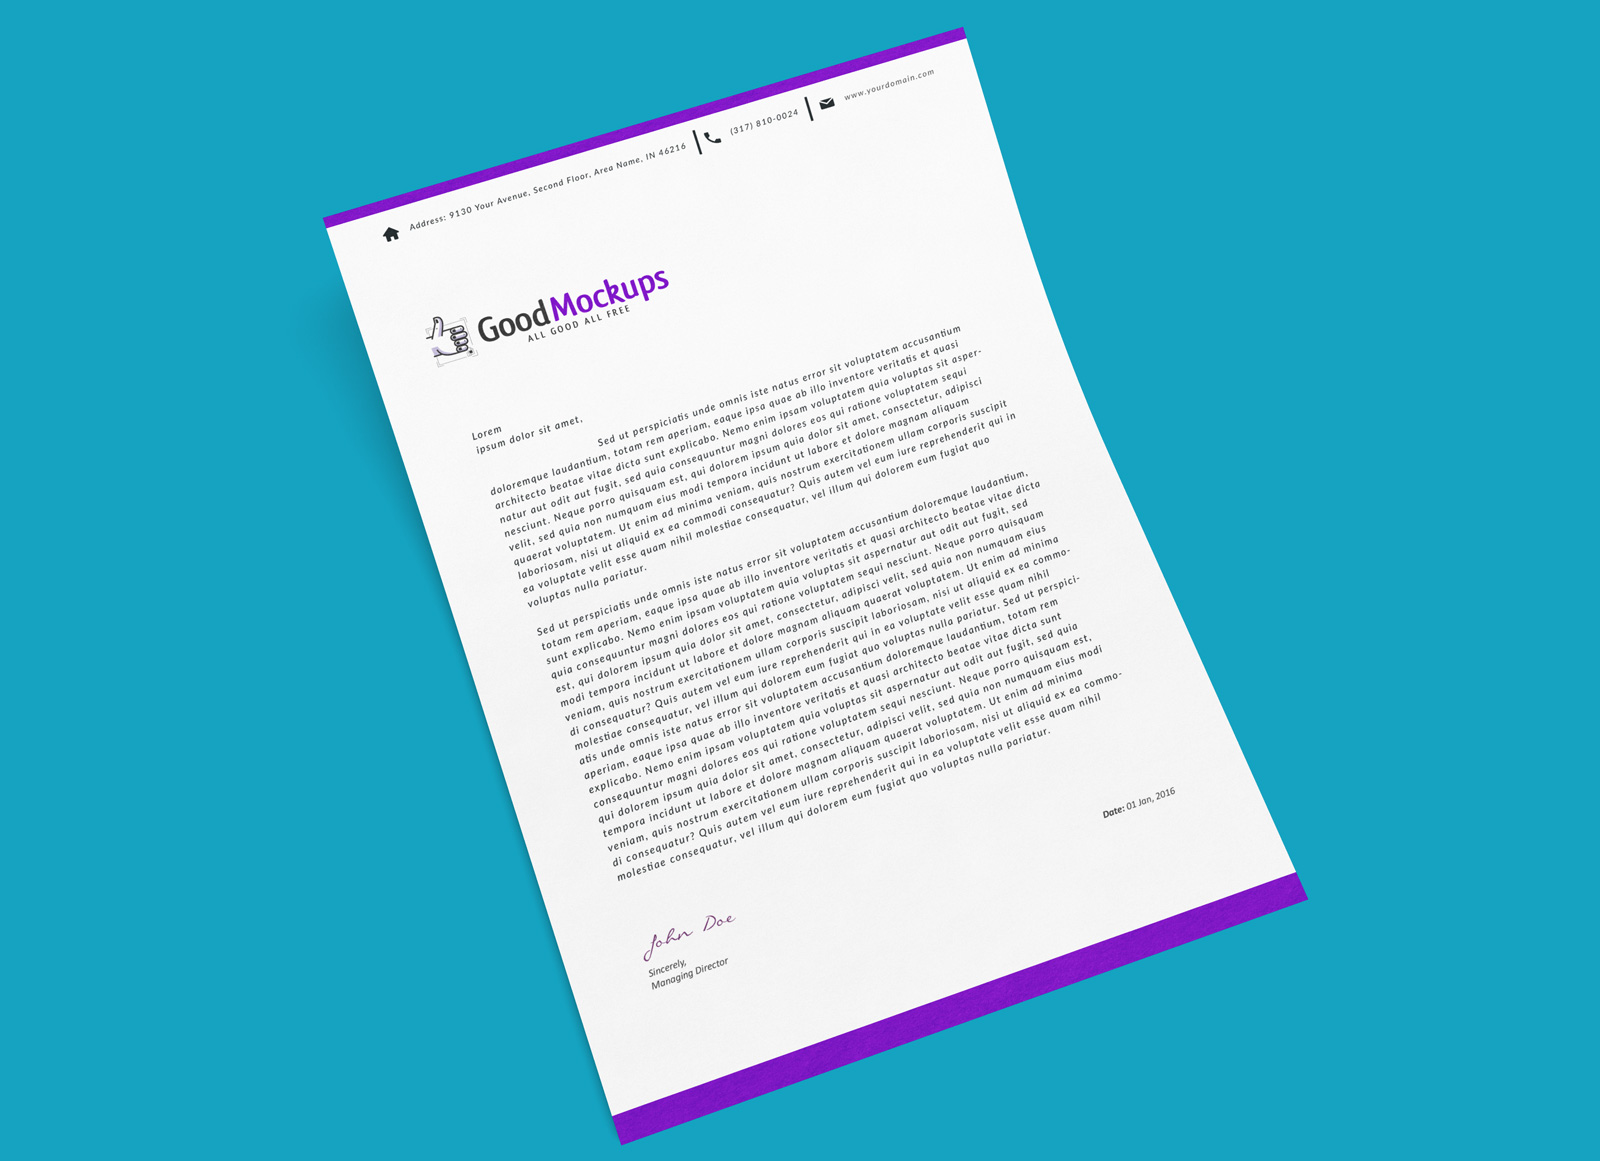 Free-A4-Letter-Size-Letterhead-Mockup-PSD